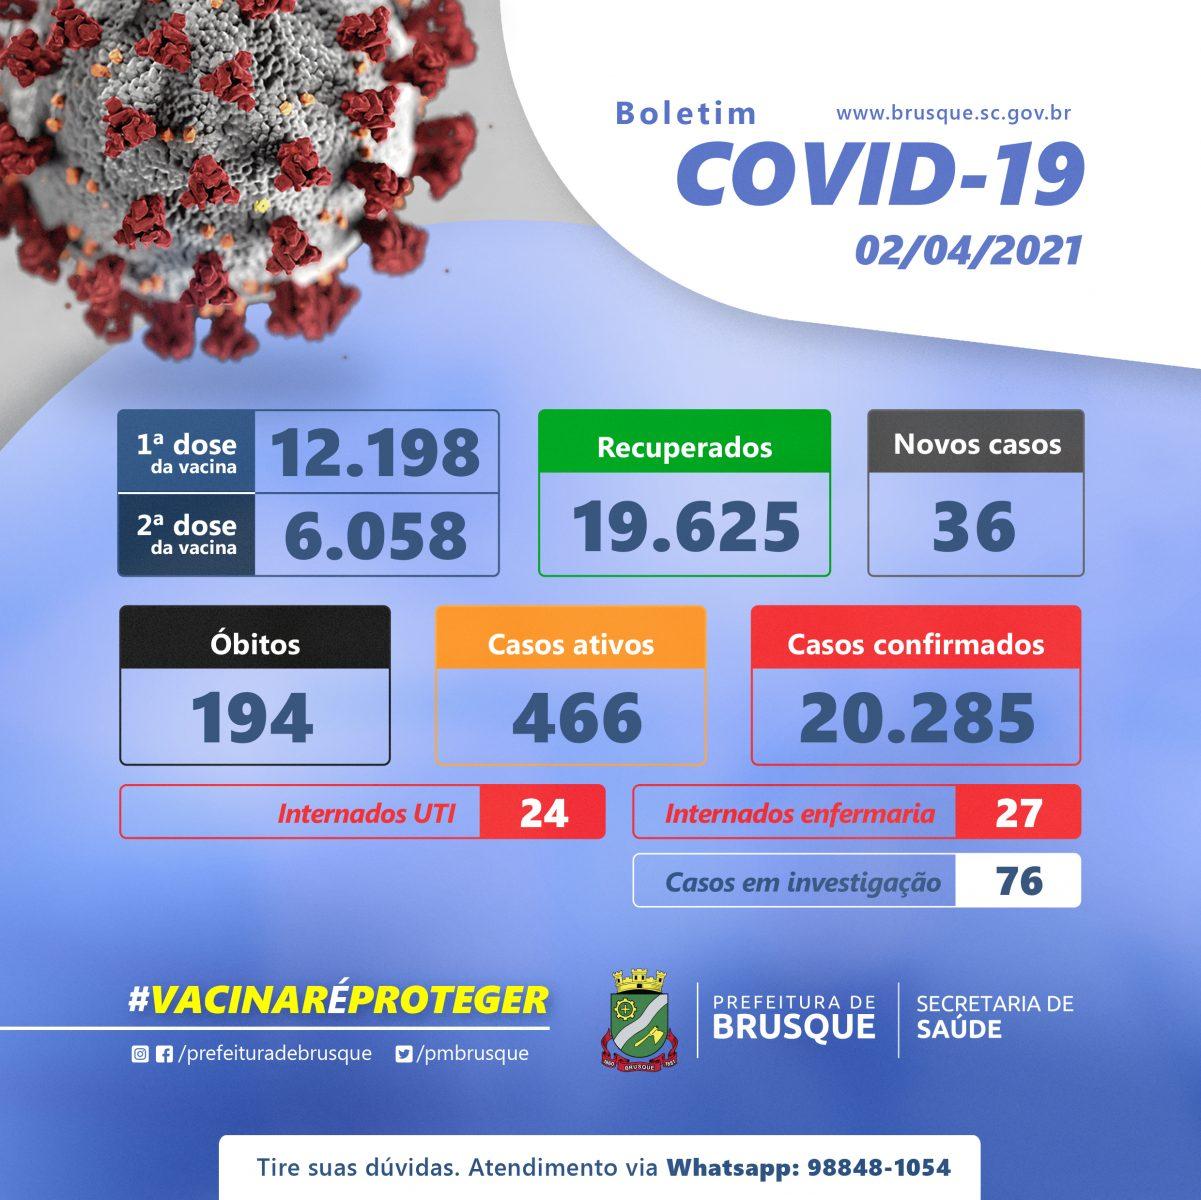 Covid-19: Confira o boletim epidemiológico desta sexta-feira (02)